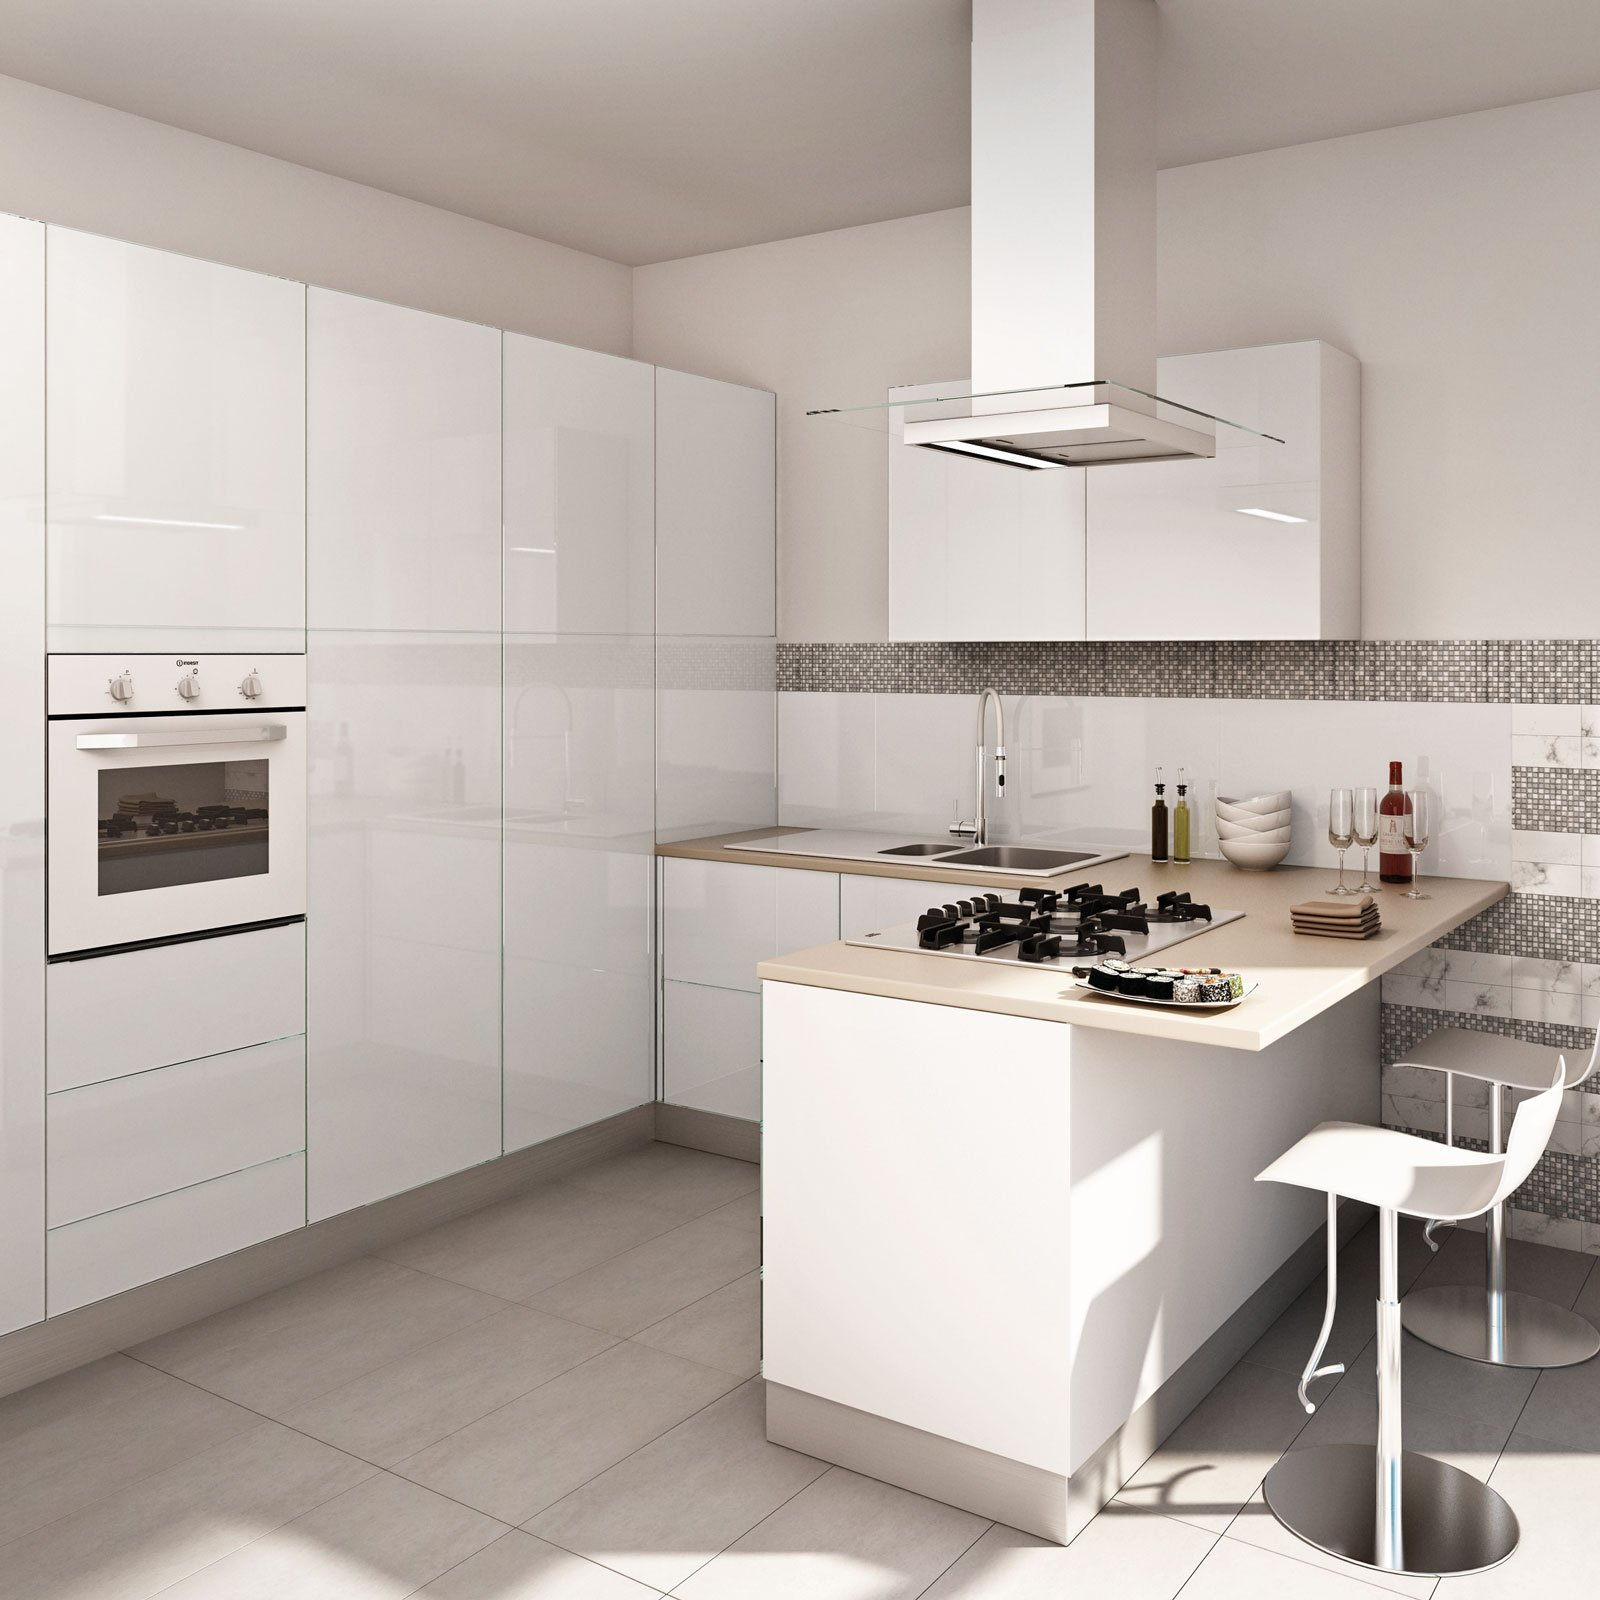 Cucina bianca il fascino eterno della luminosit cose di casa - Cucina bianca lucida ...